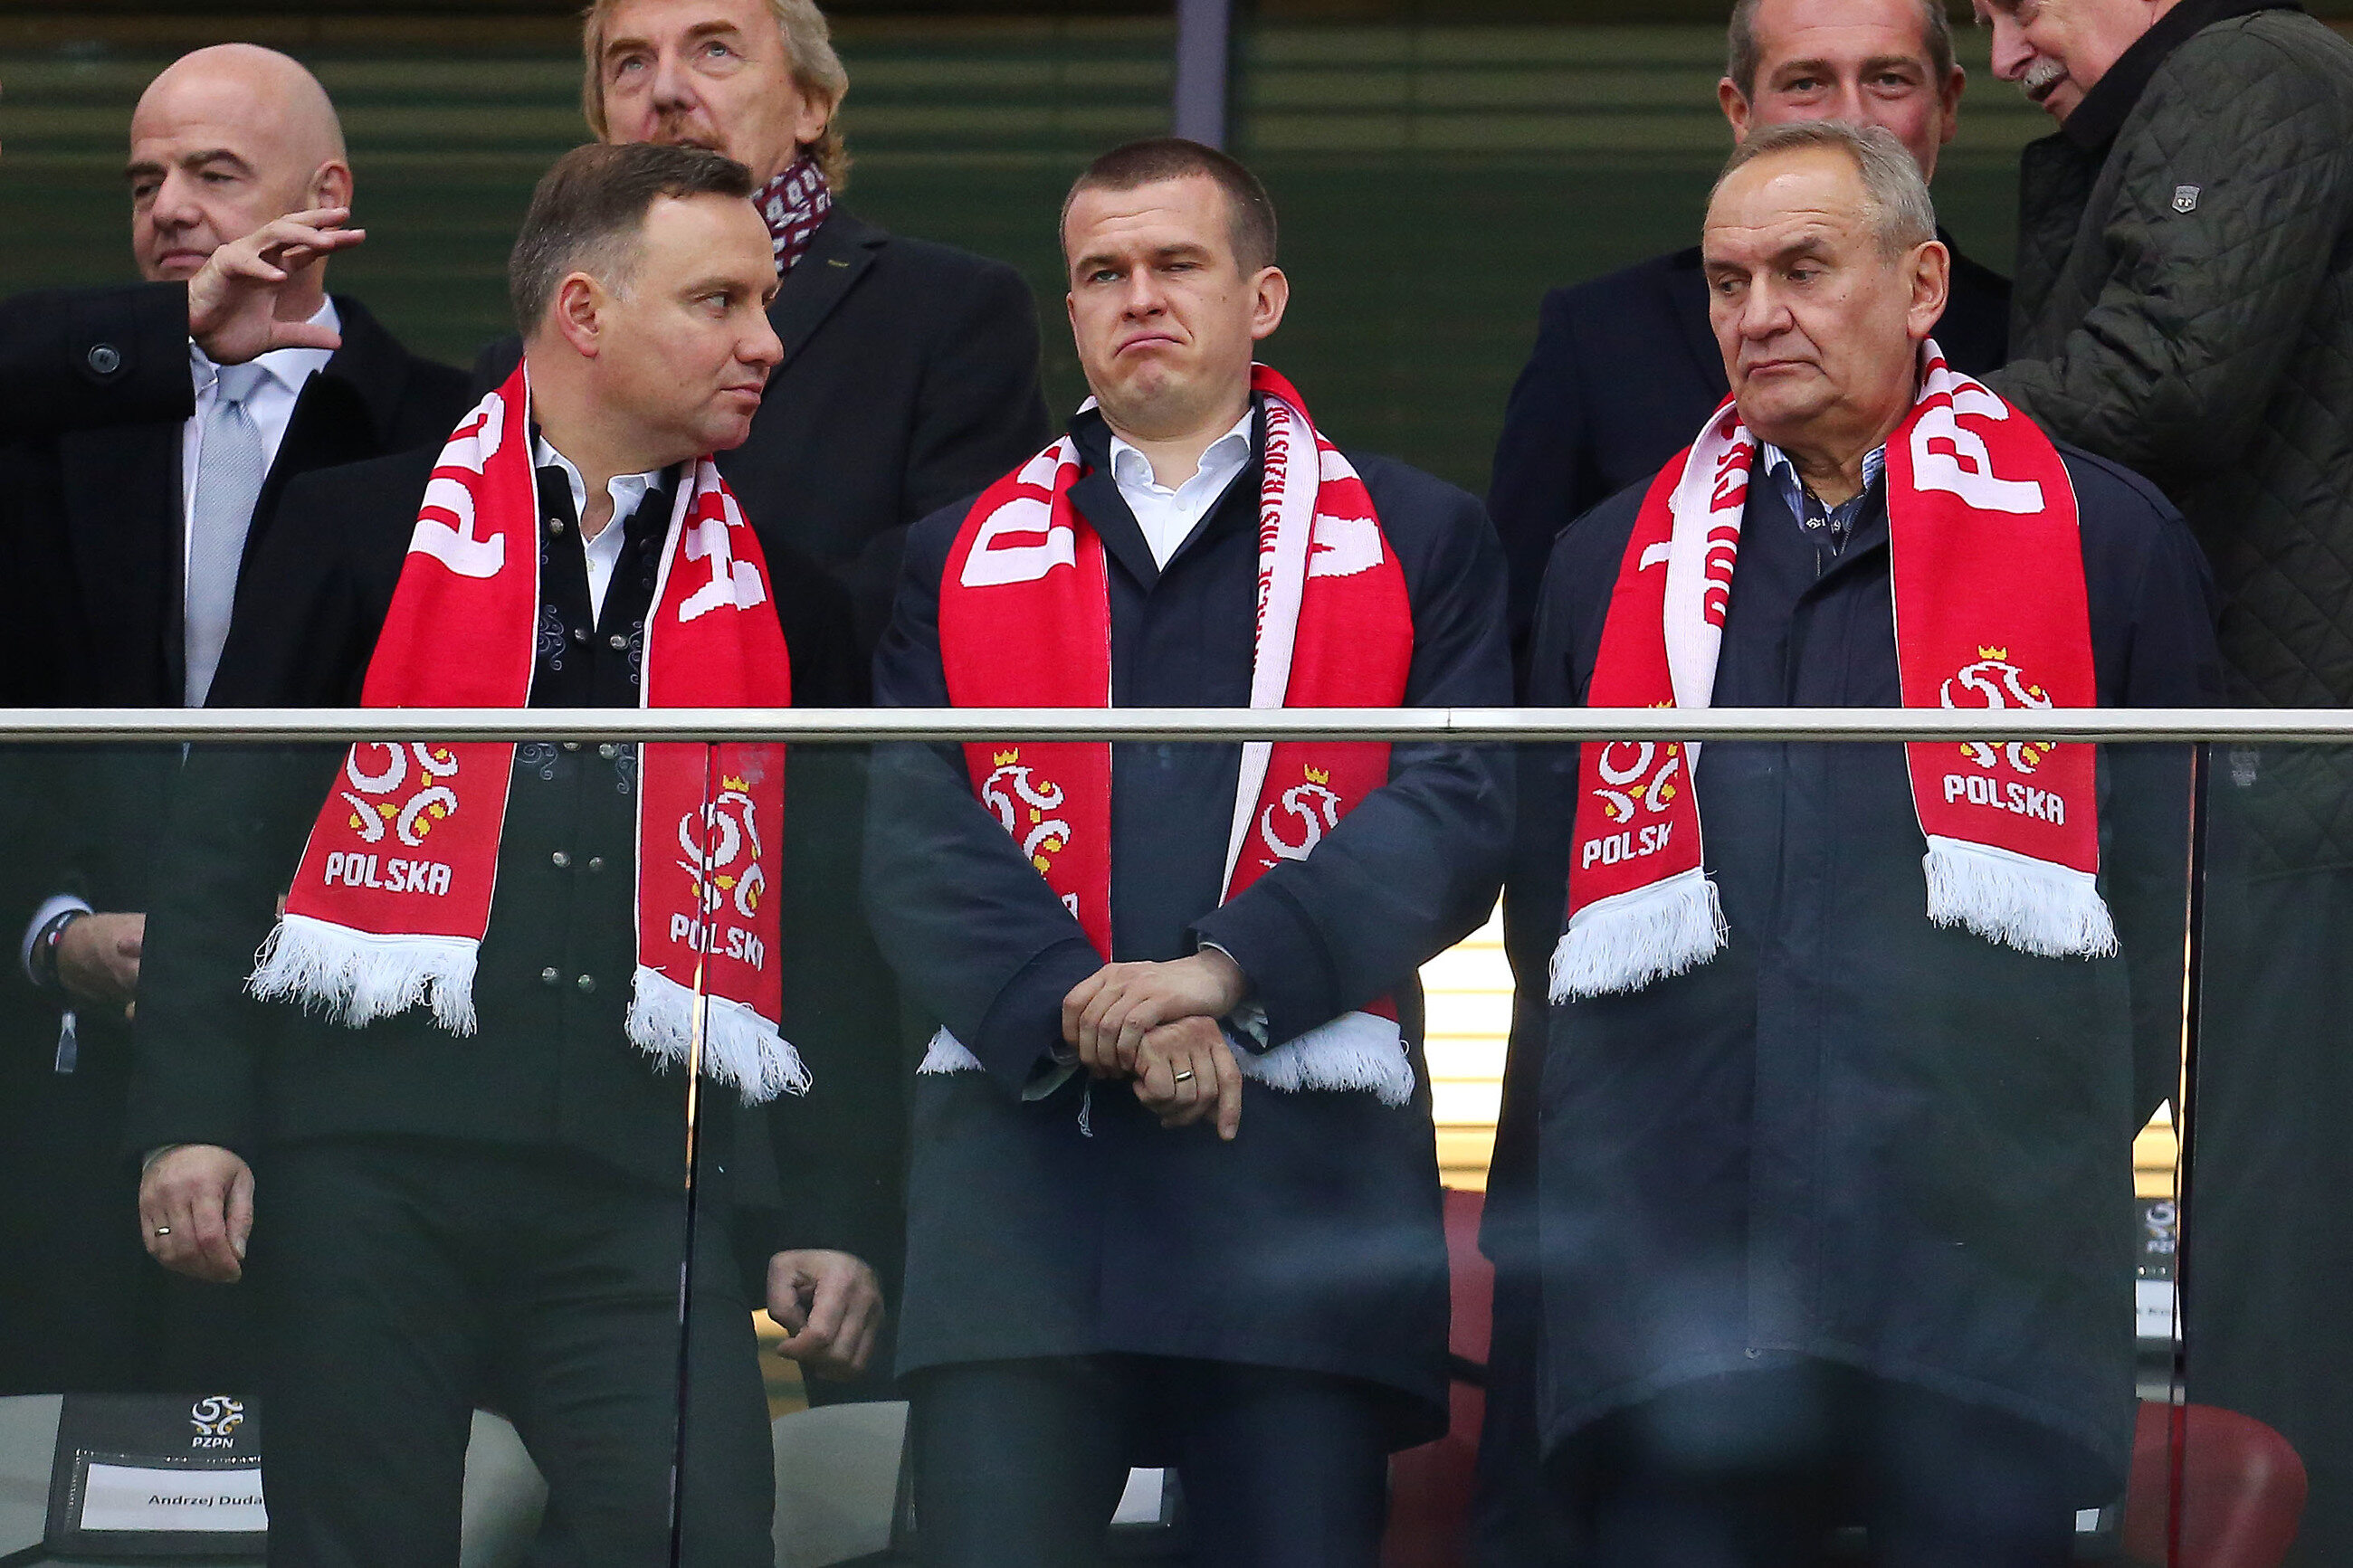 Andrzej Duda, Witold Banka